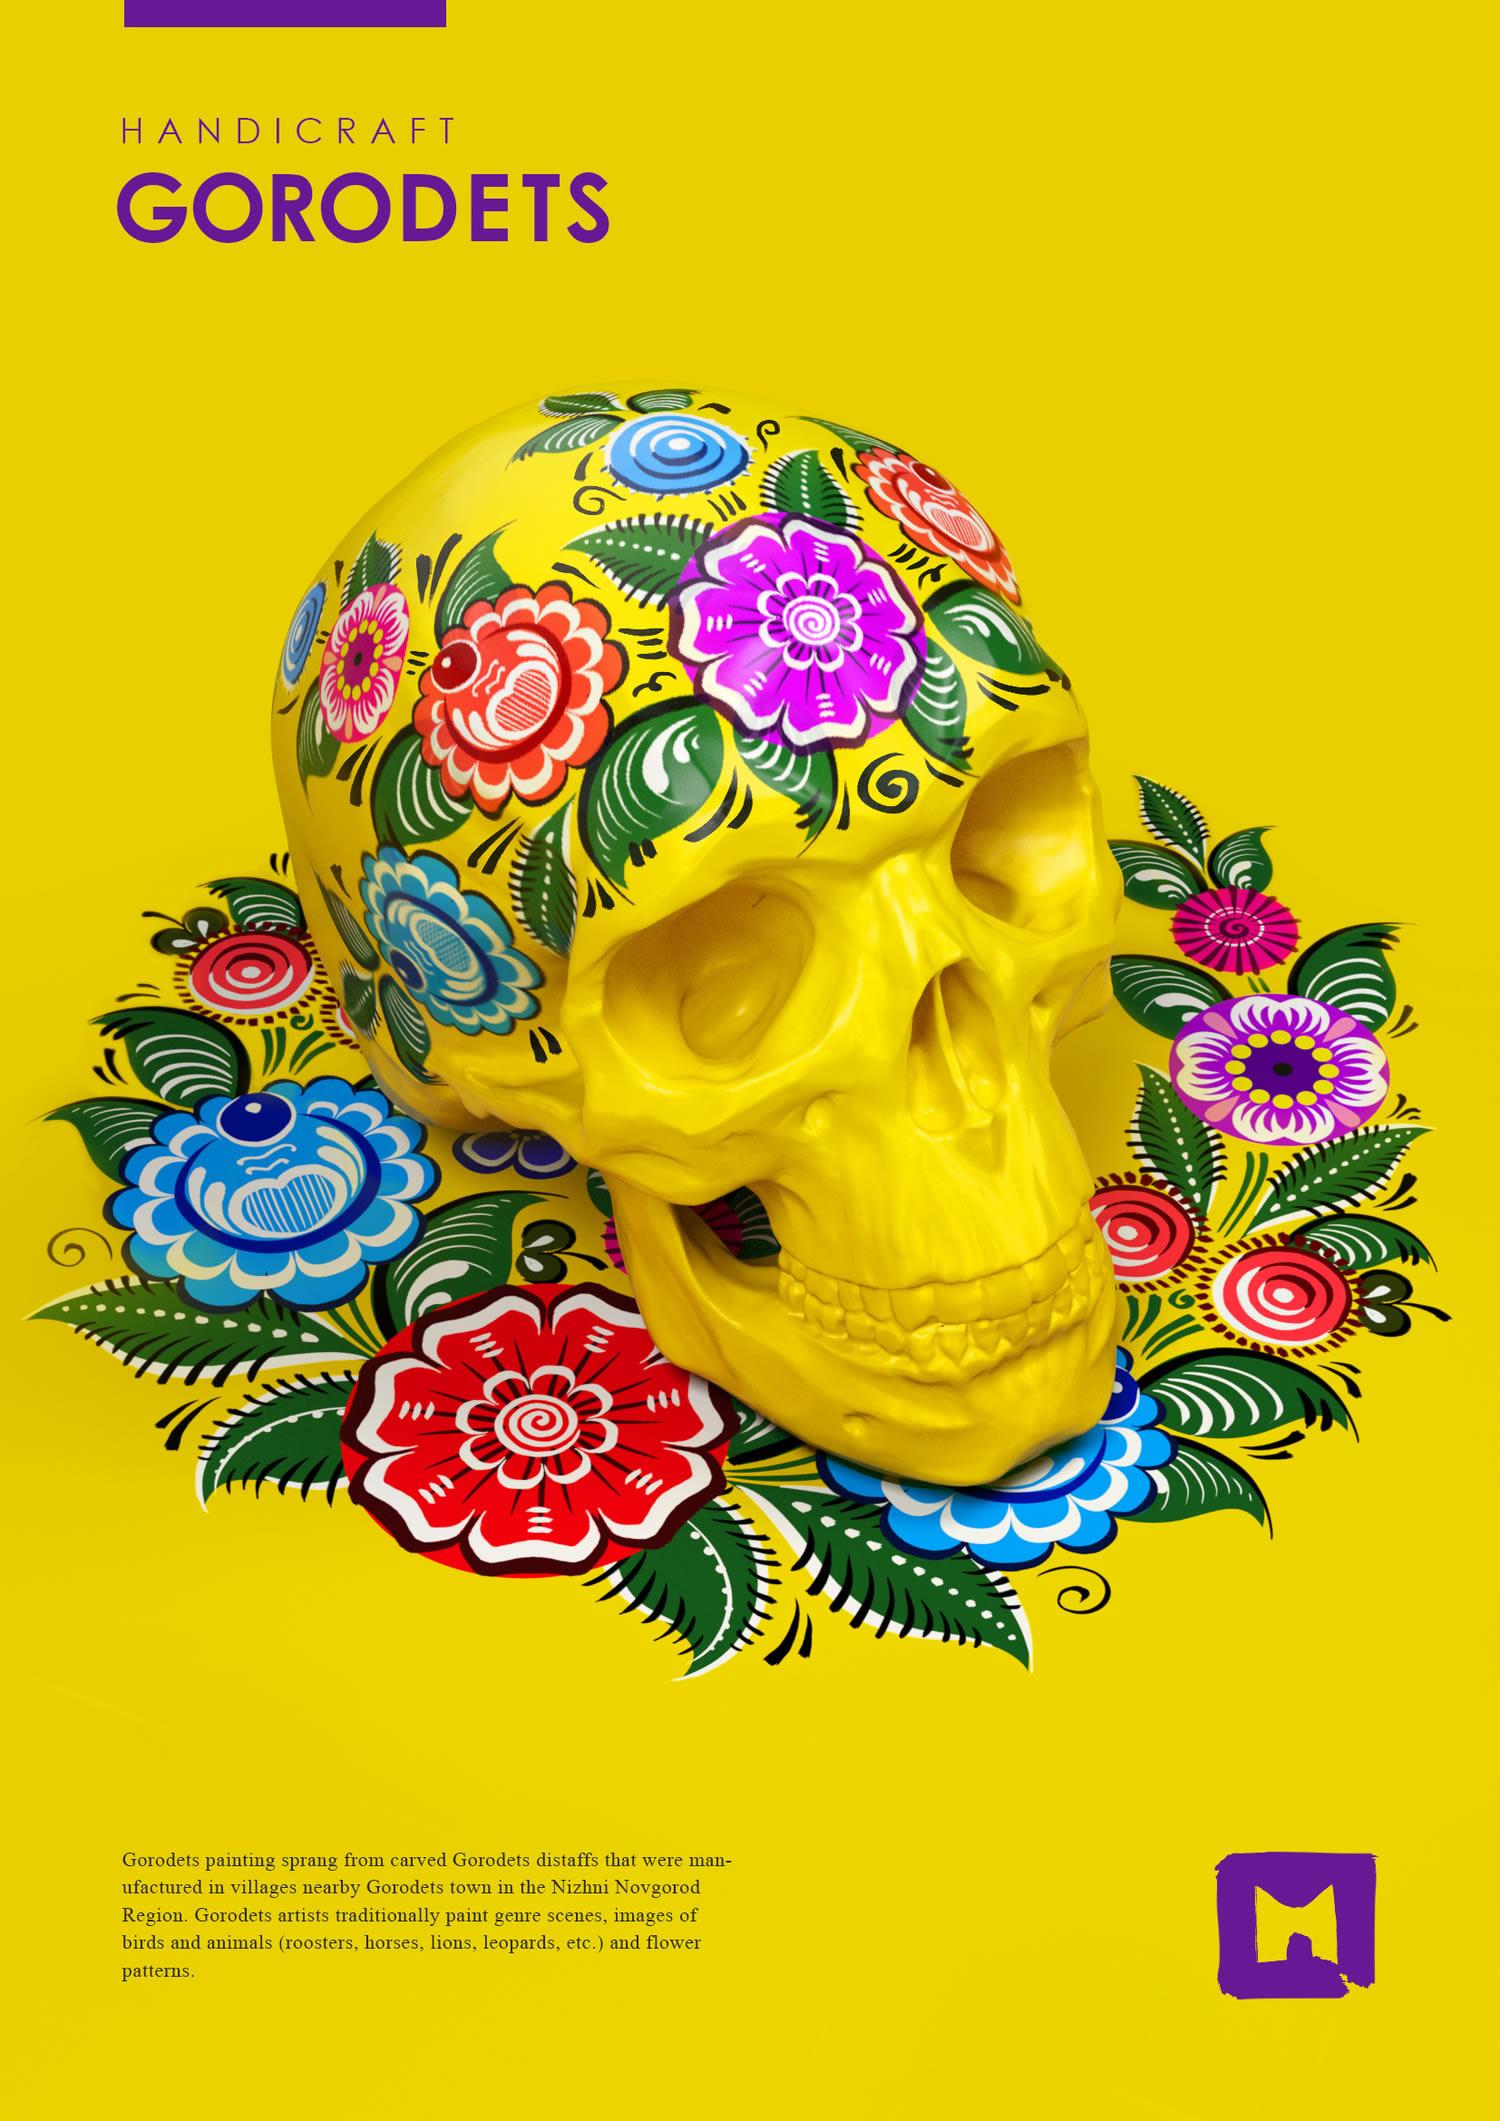 skull, yellow background, folk fusion by Aleksandra Vinogradova